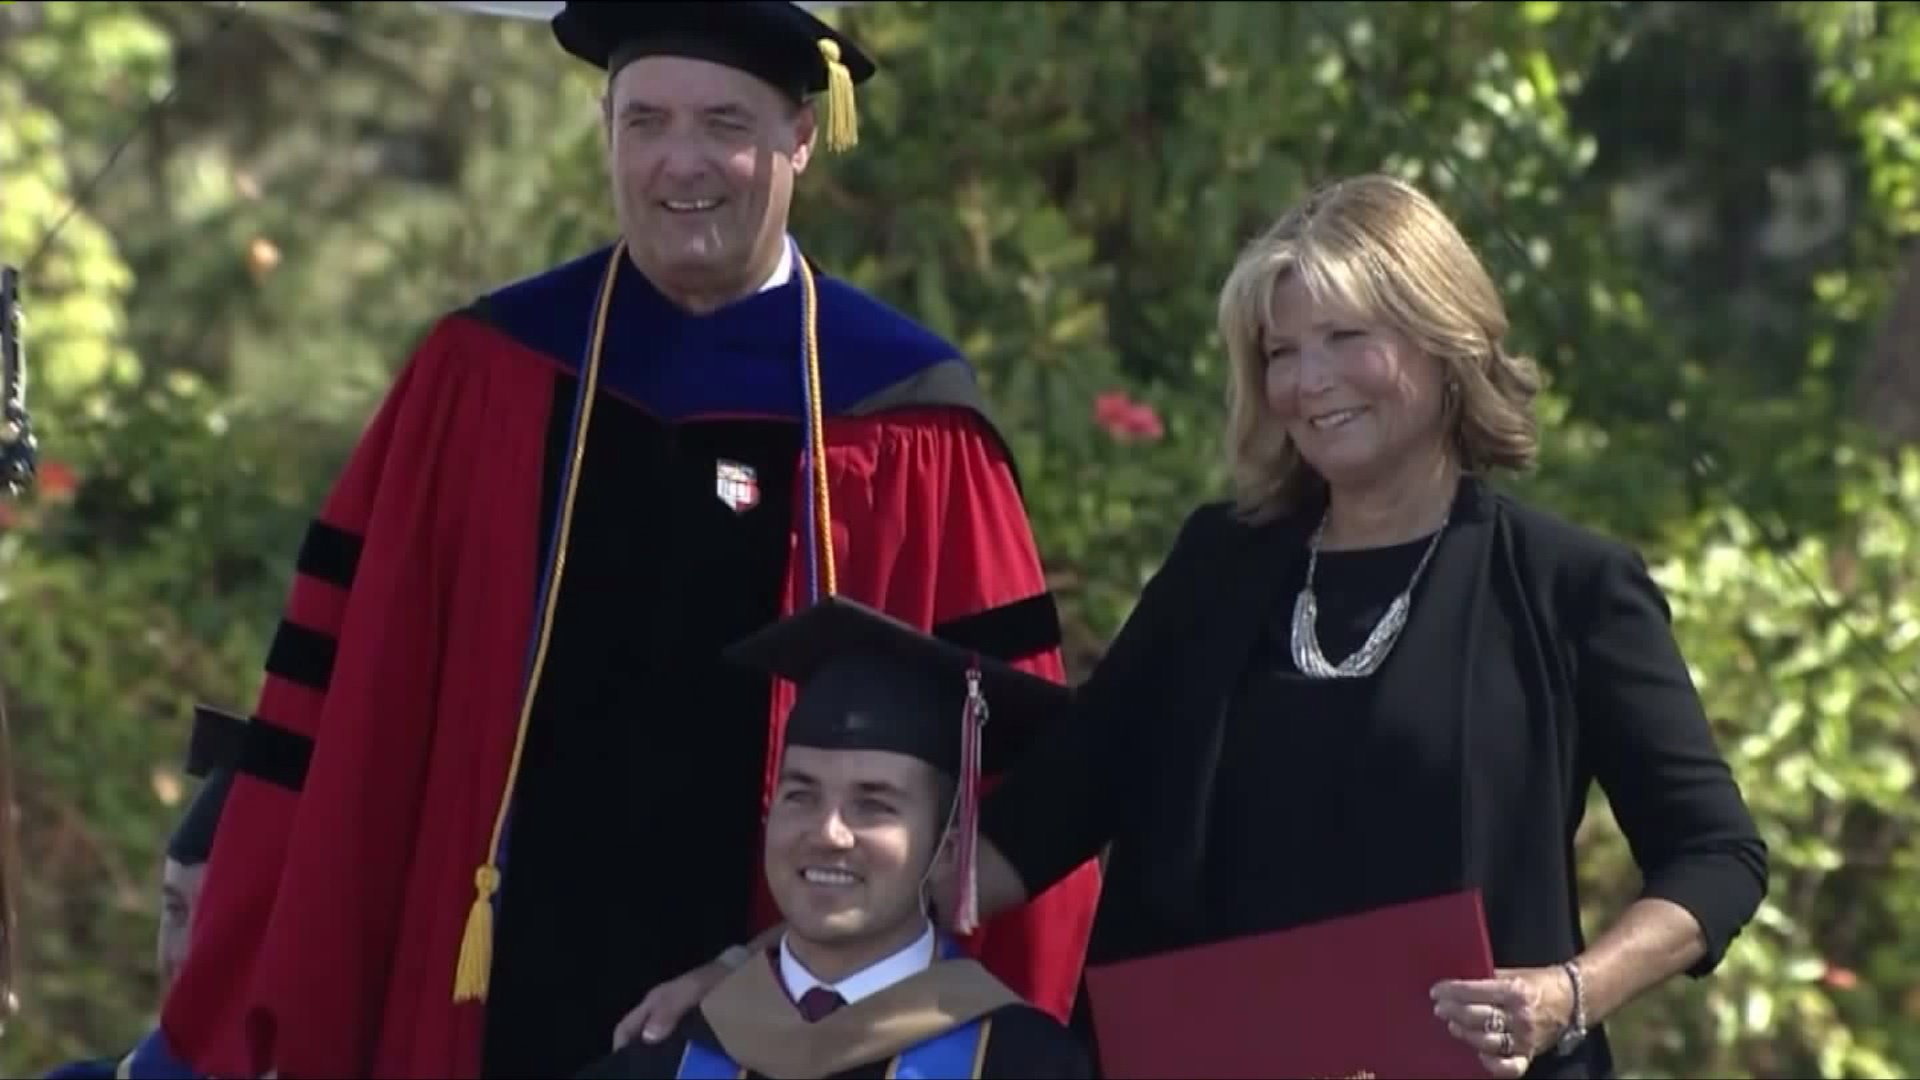 Mom gets degree, too, after helping quadriplegic son